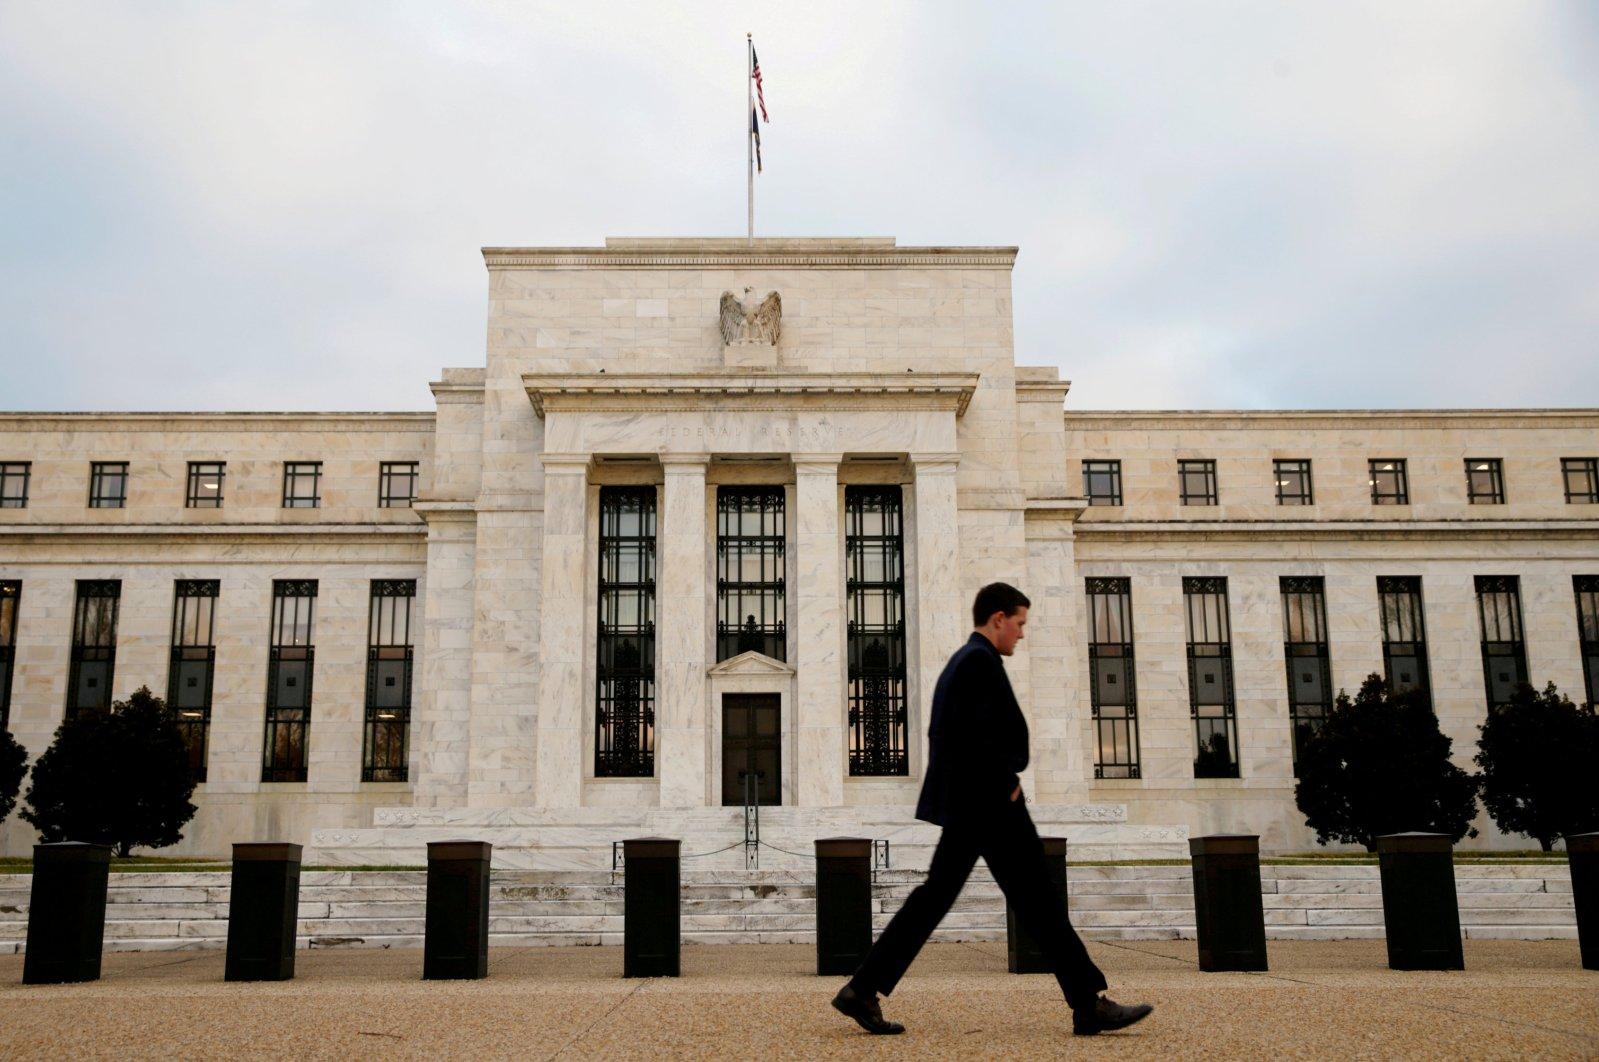 A man walks past the Federal Reserve Bank in Washington, D.C., U.S., Dec. 16, 2015. (Reuters Photo)